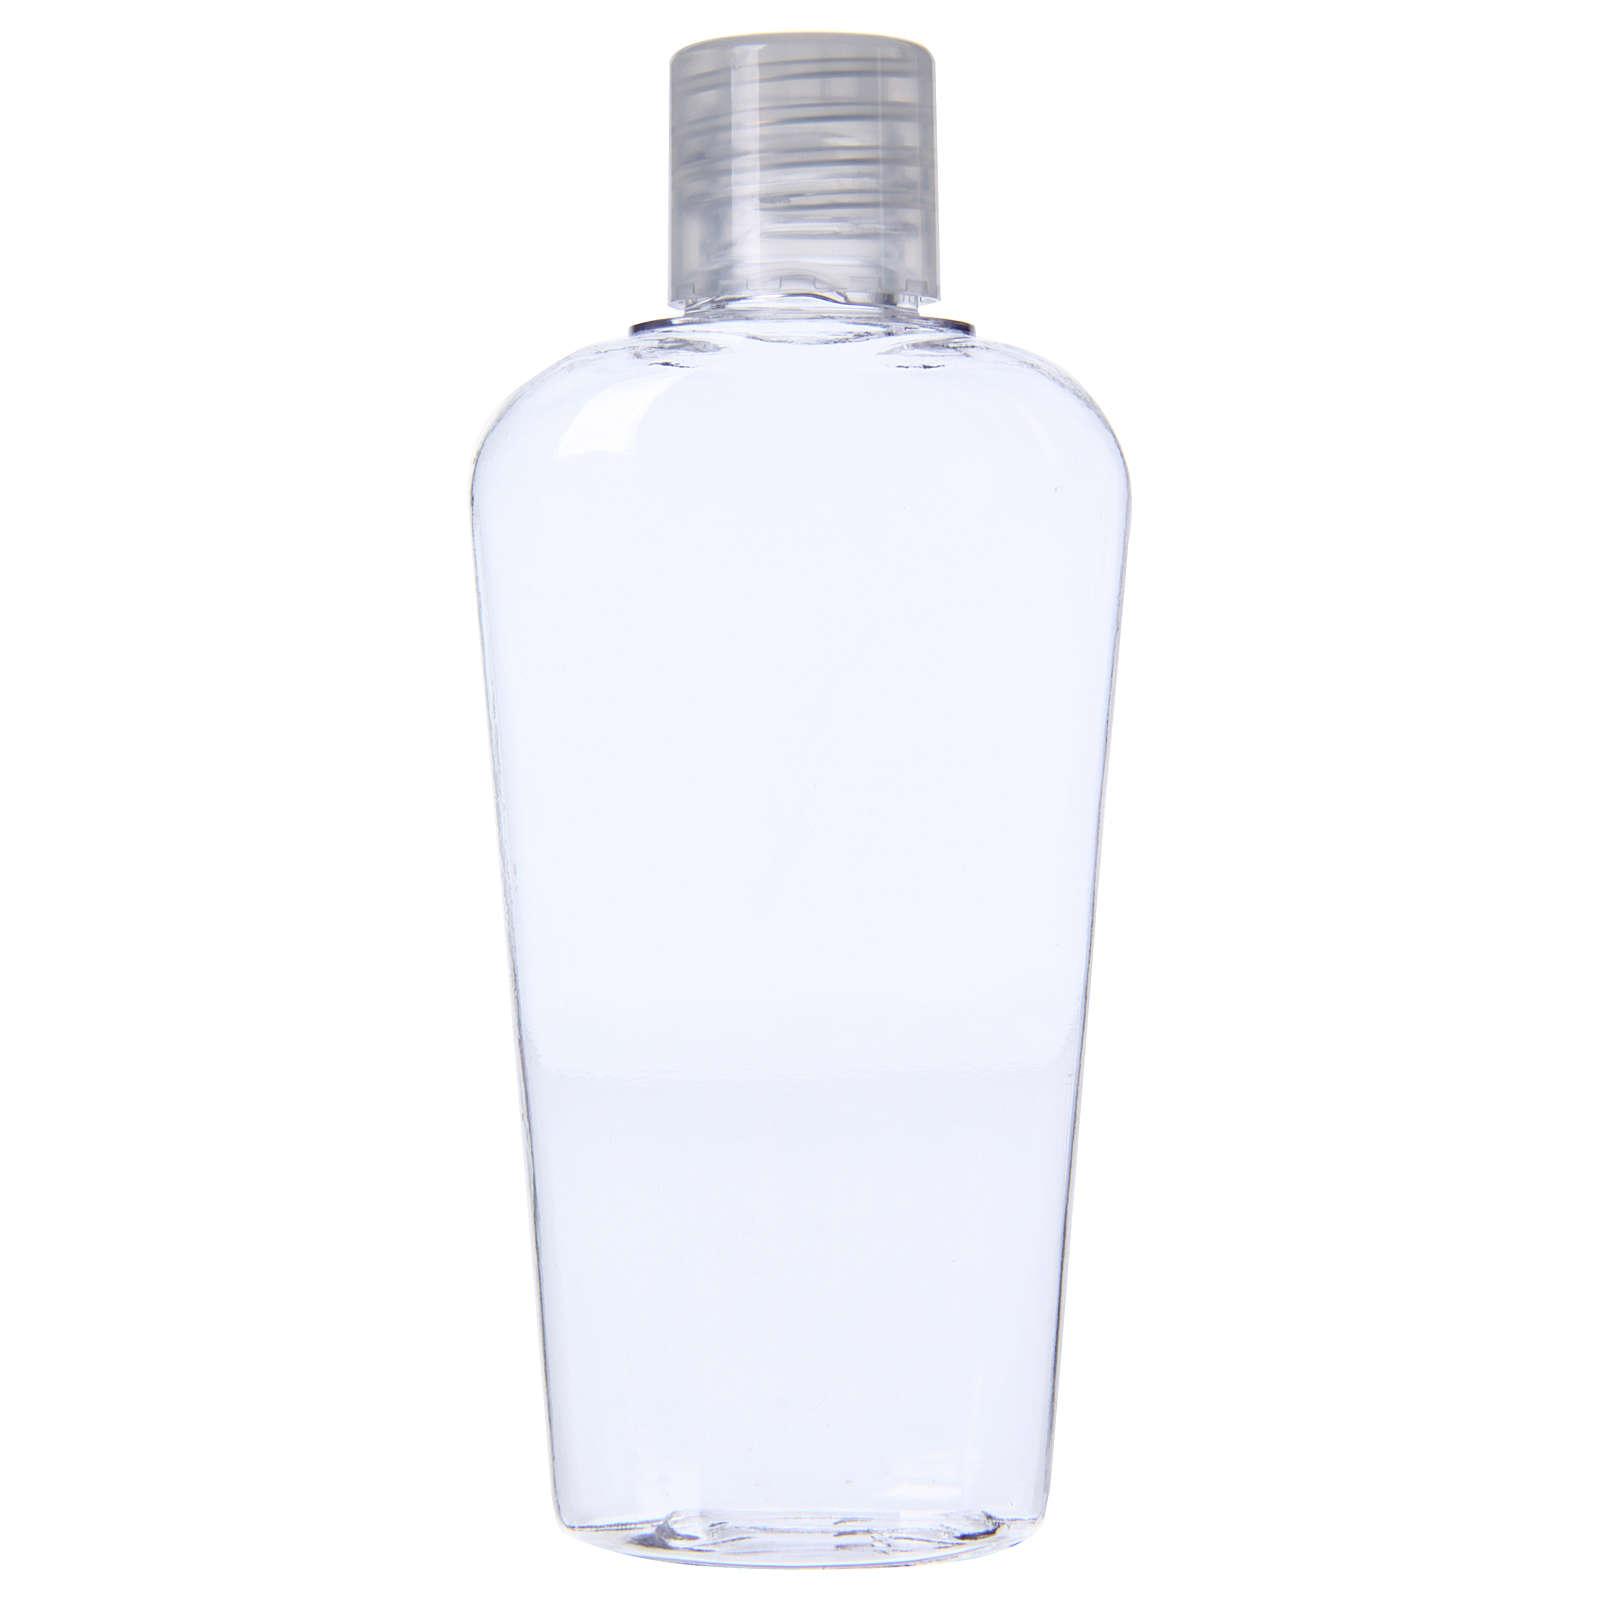 Botellas para agua bendita 75 ml caja 100 piezas 3